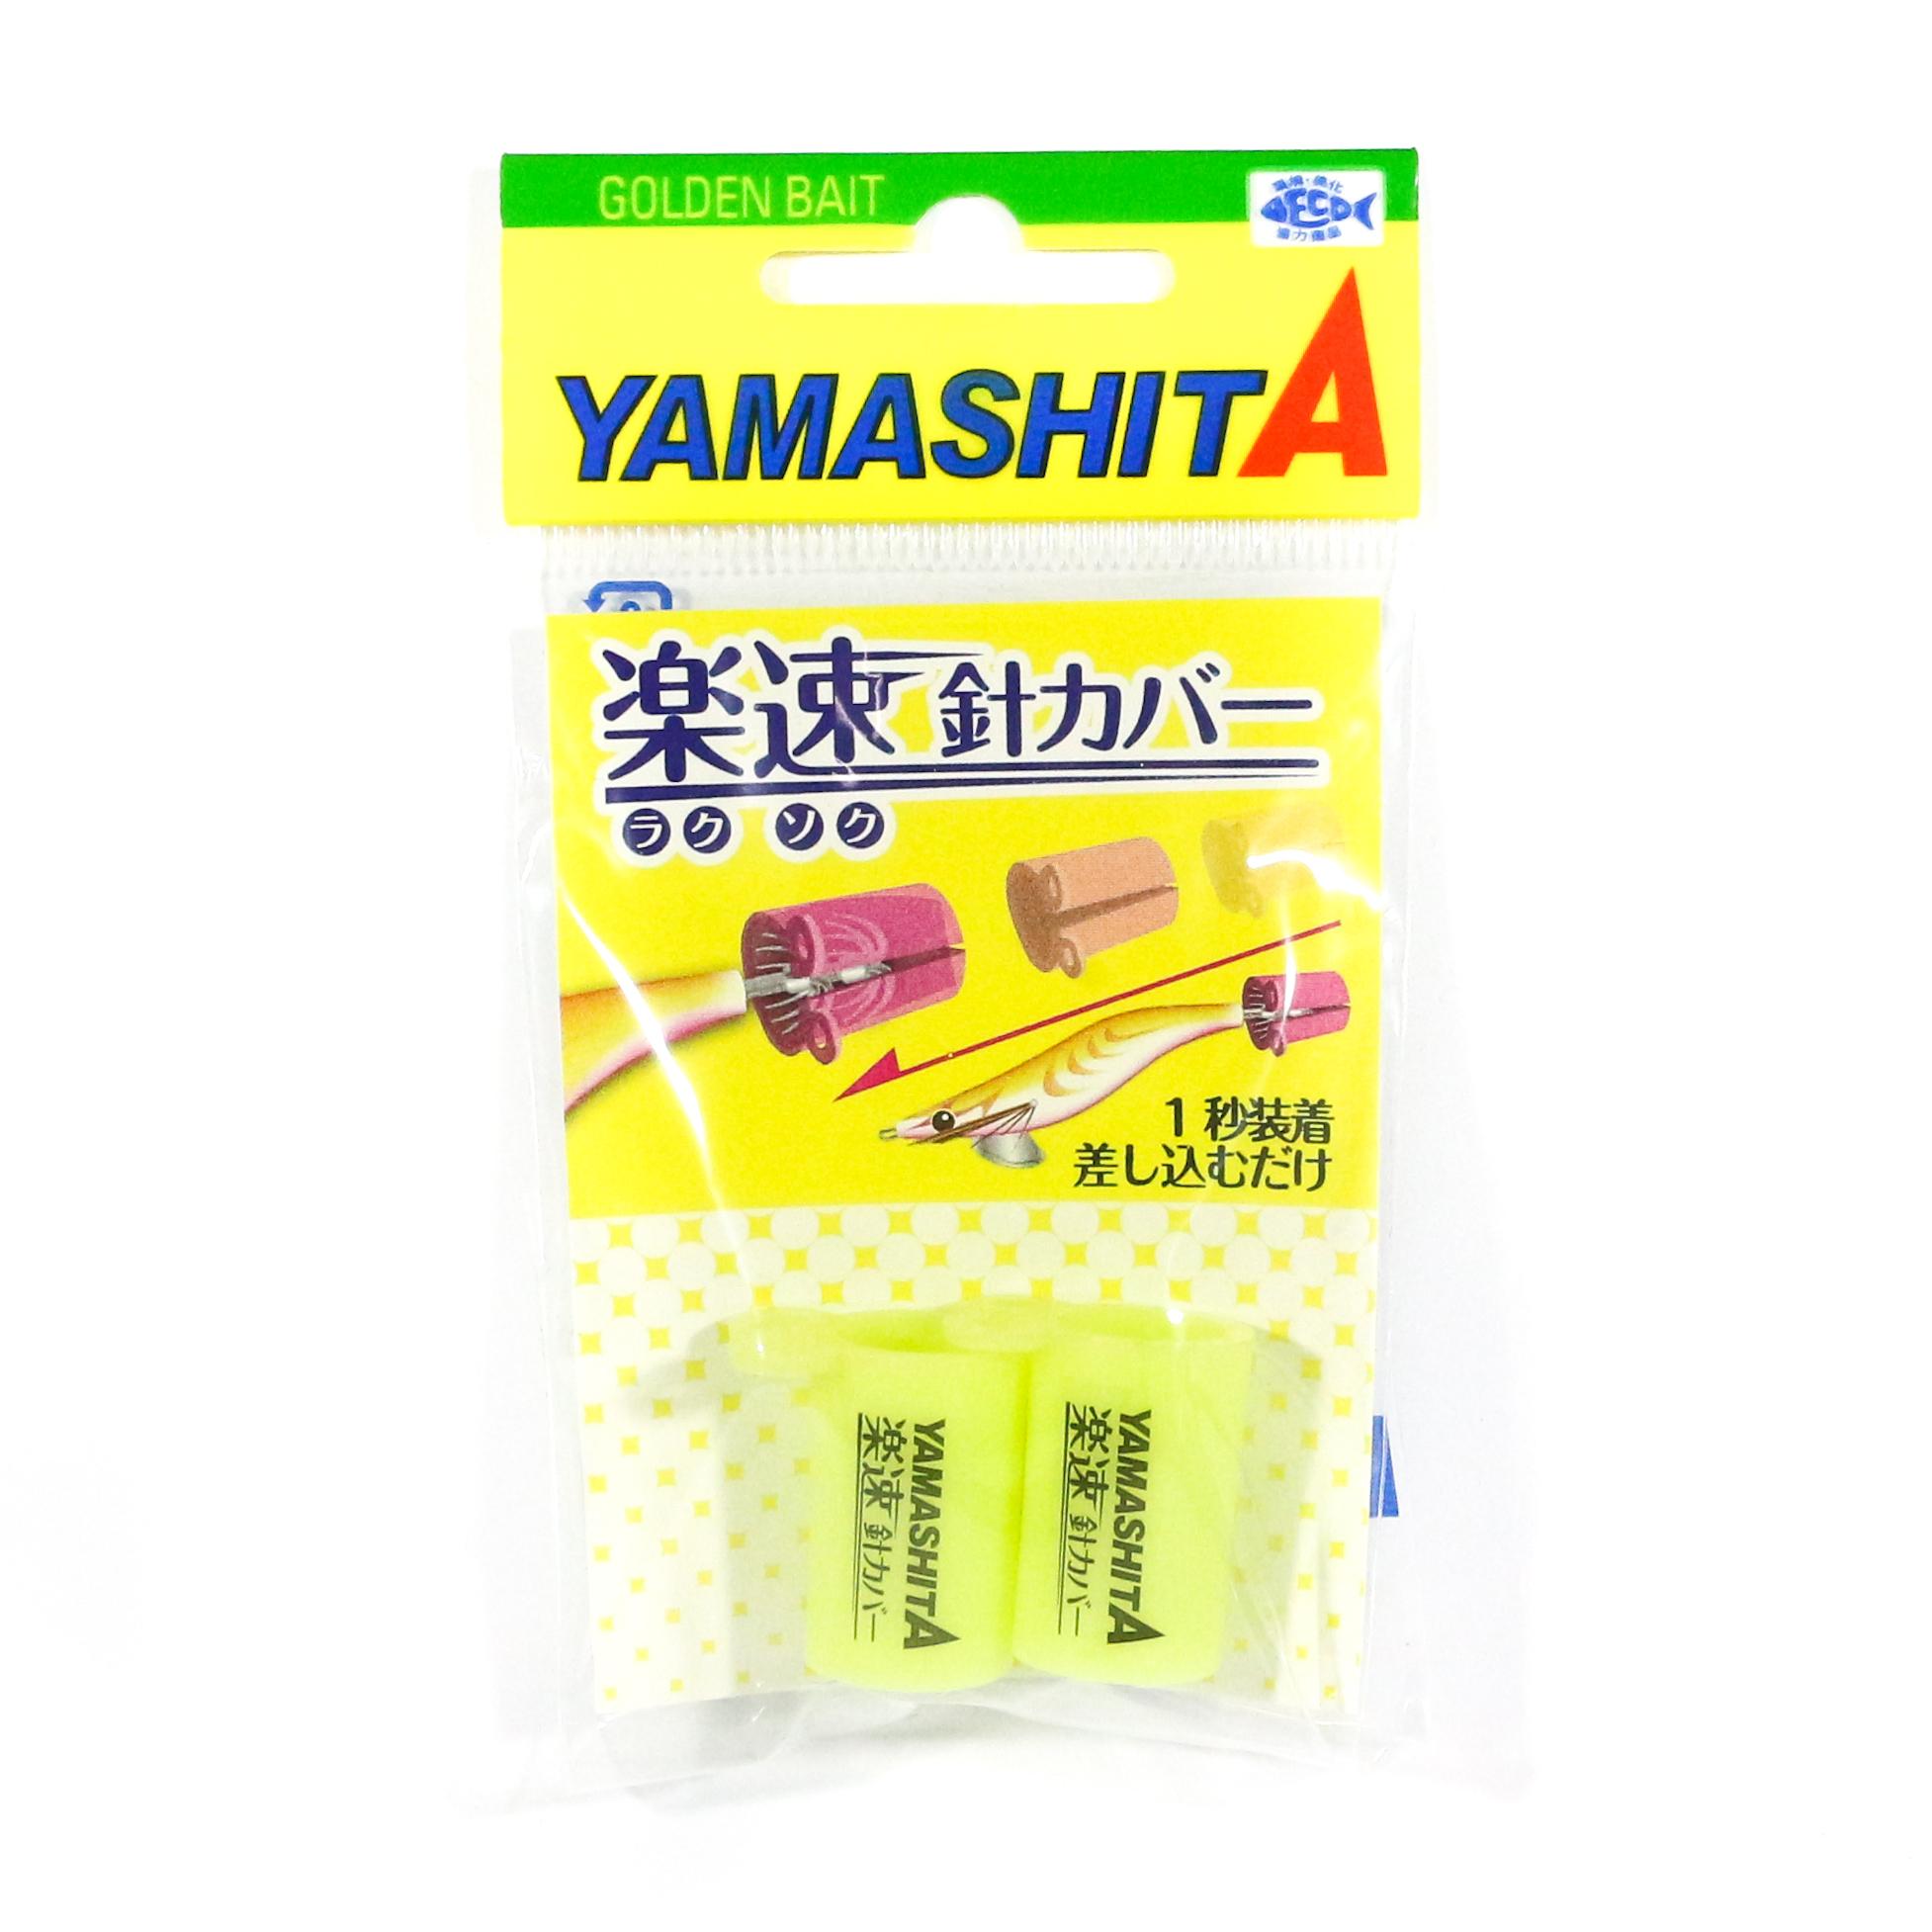 Yamashita Rakusoku Squid Jig Cover Size S 1.5 - 2.5 (2 pieces) Y (9995)